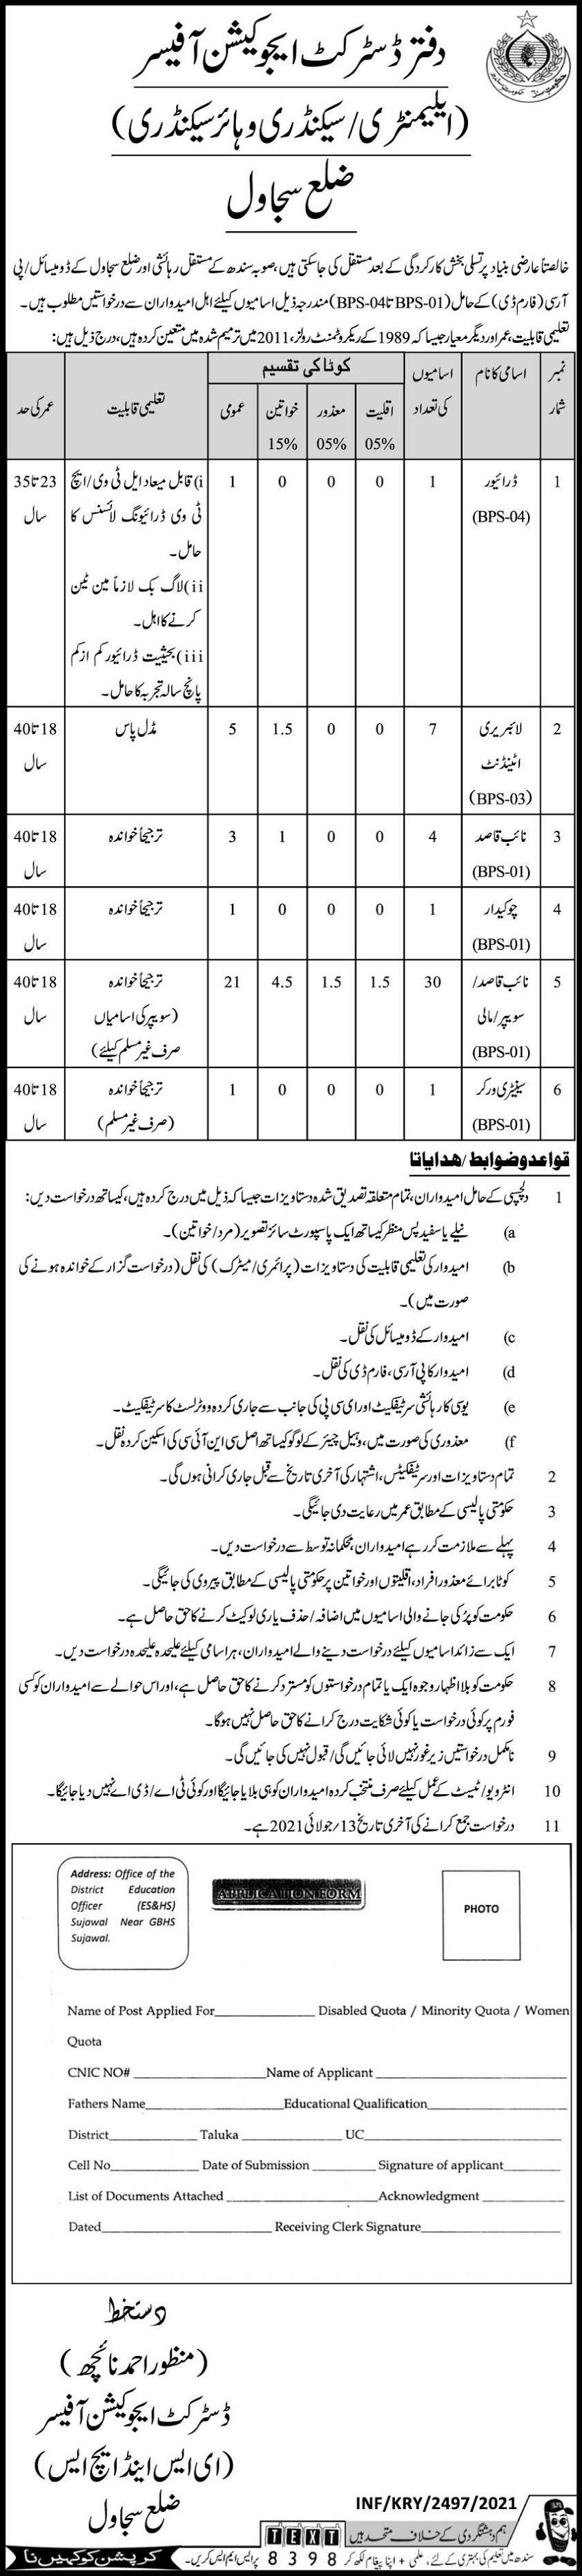 Sindh Elementary Secondary & Higher Secondary School Department Latest Jobs 2021 Advertisement - Government of Sindh Education Department Jobs 2021